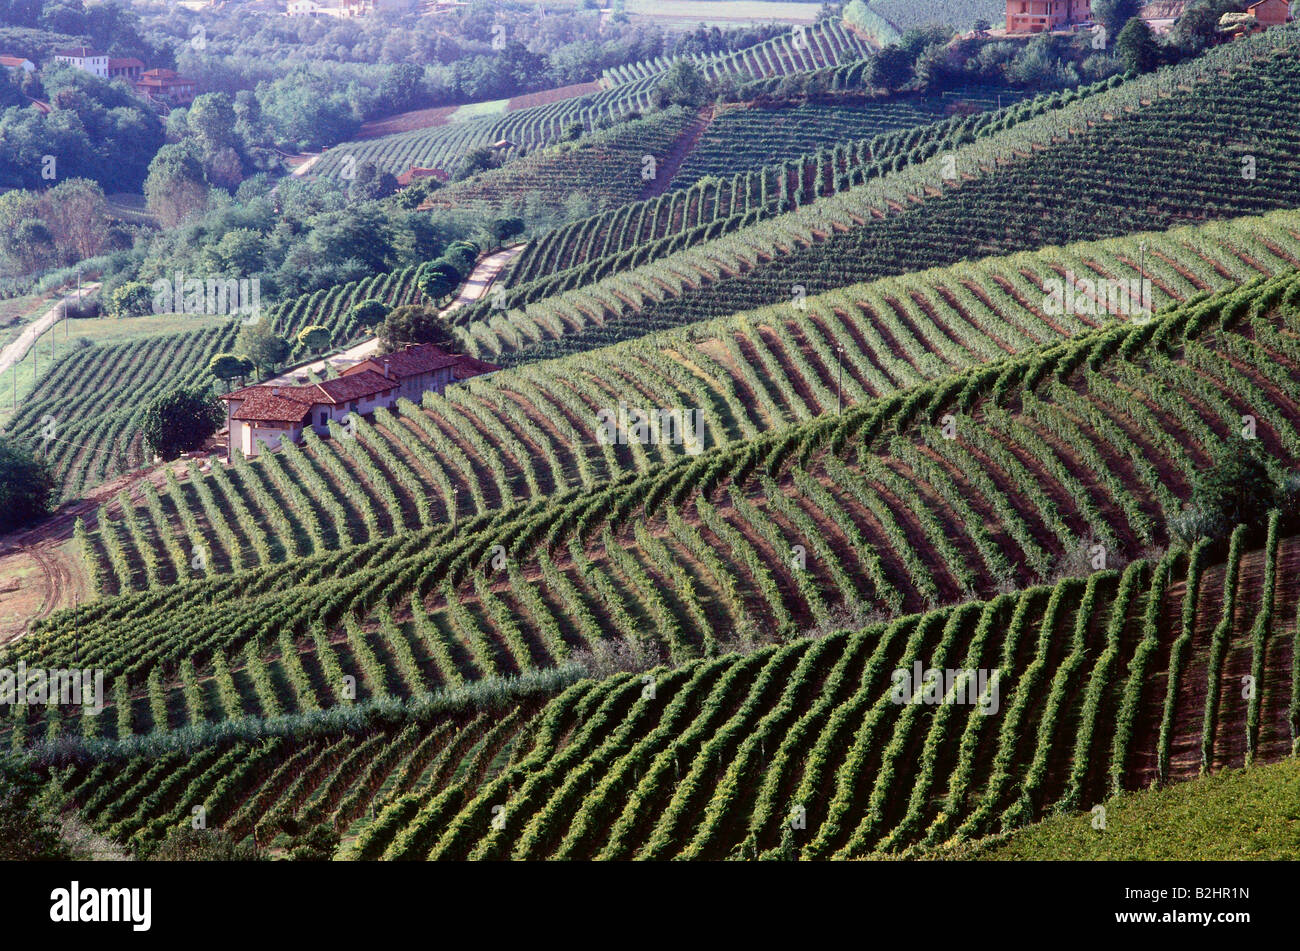 geography / travel, Italy, landscapes, Piemont, Barbaresco, vineyards, vine, vineyards, cultivation, vine-growing, - Stock Image